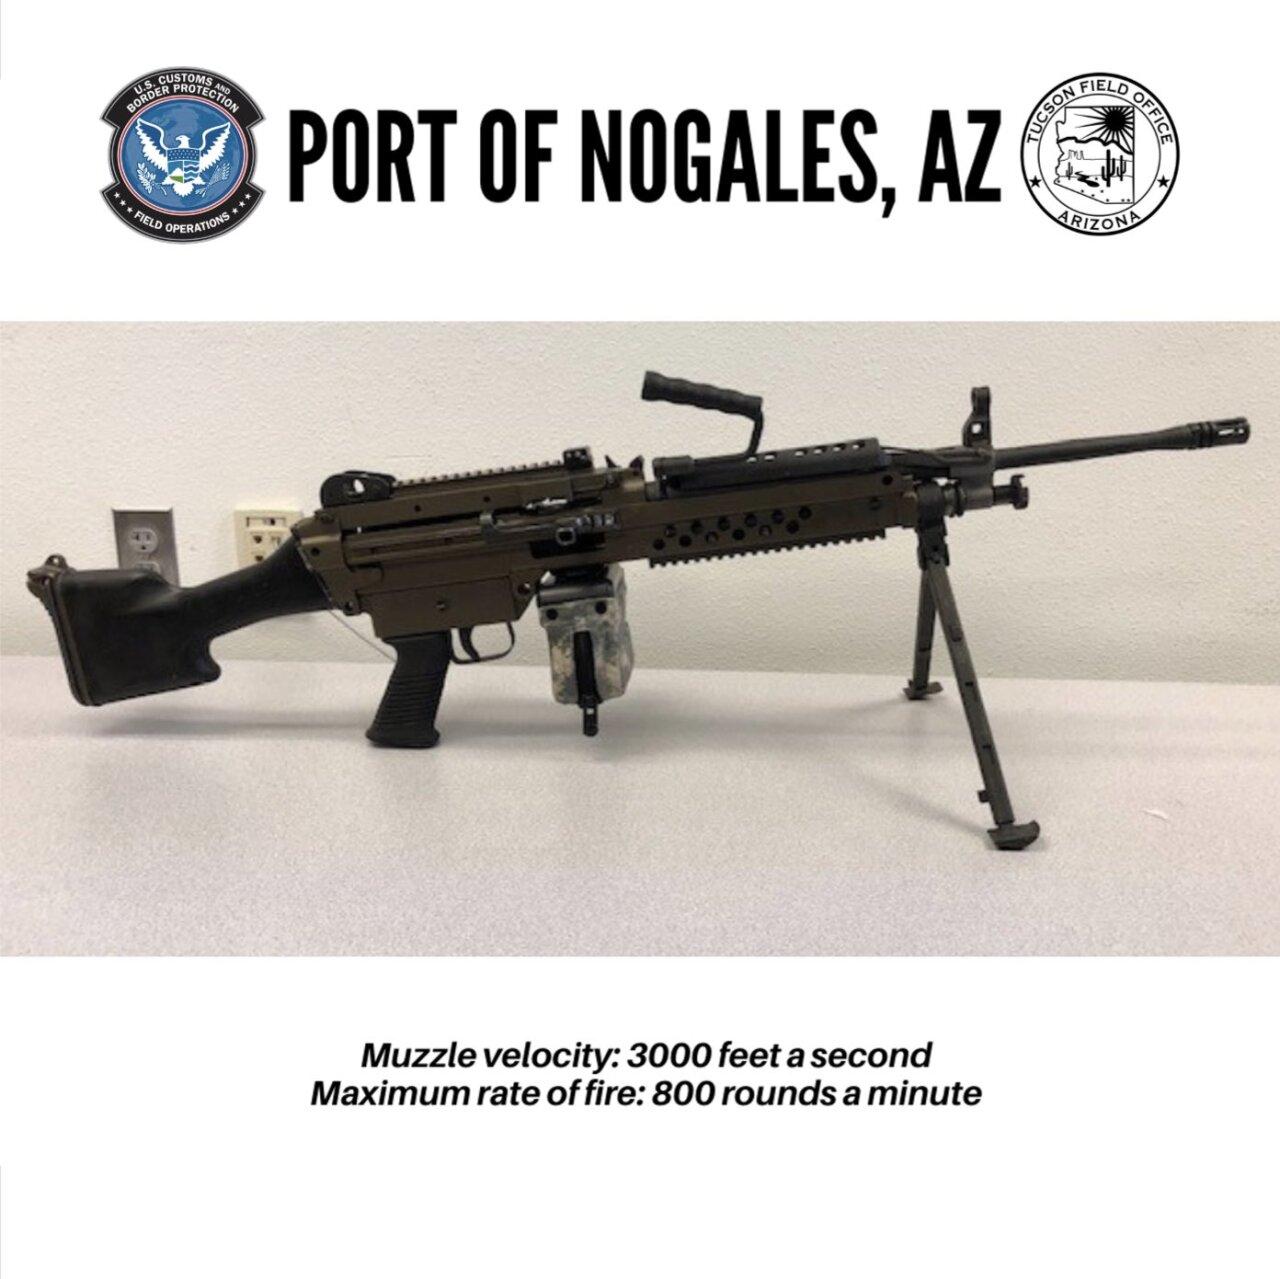 U.S. Customs and Border Protection gun seizure